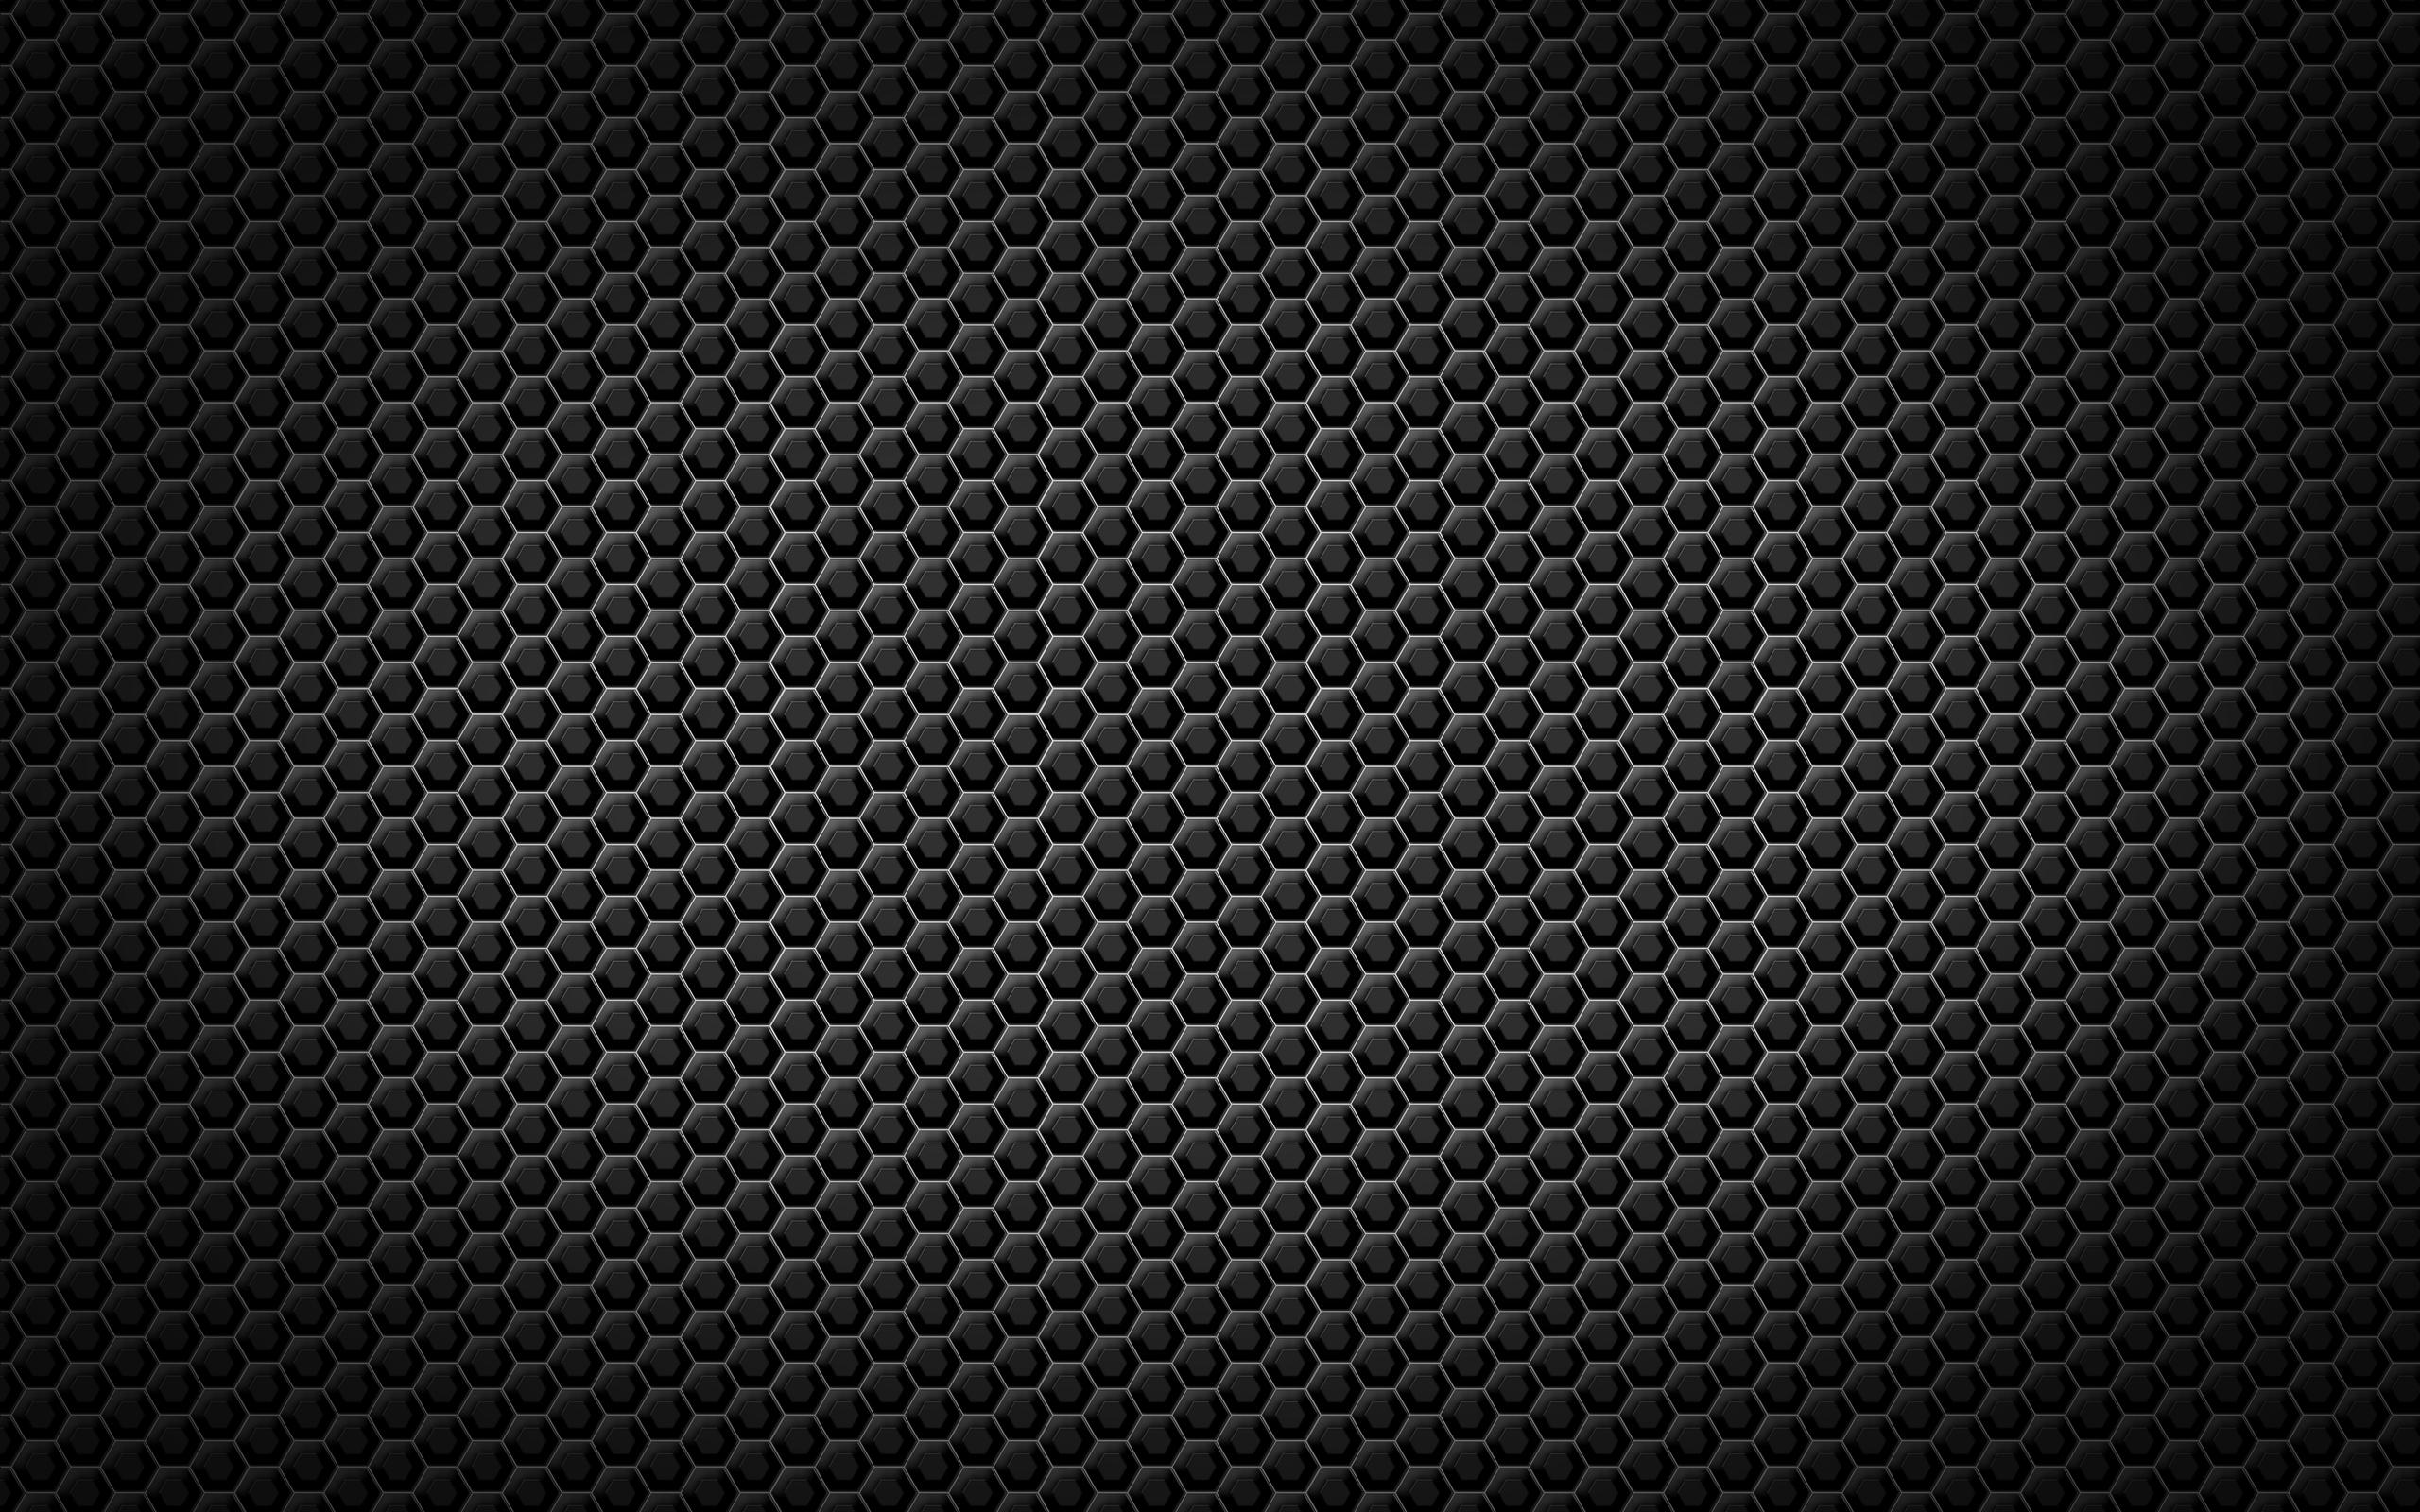 Black Pattern Wallpaper Free